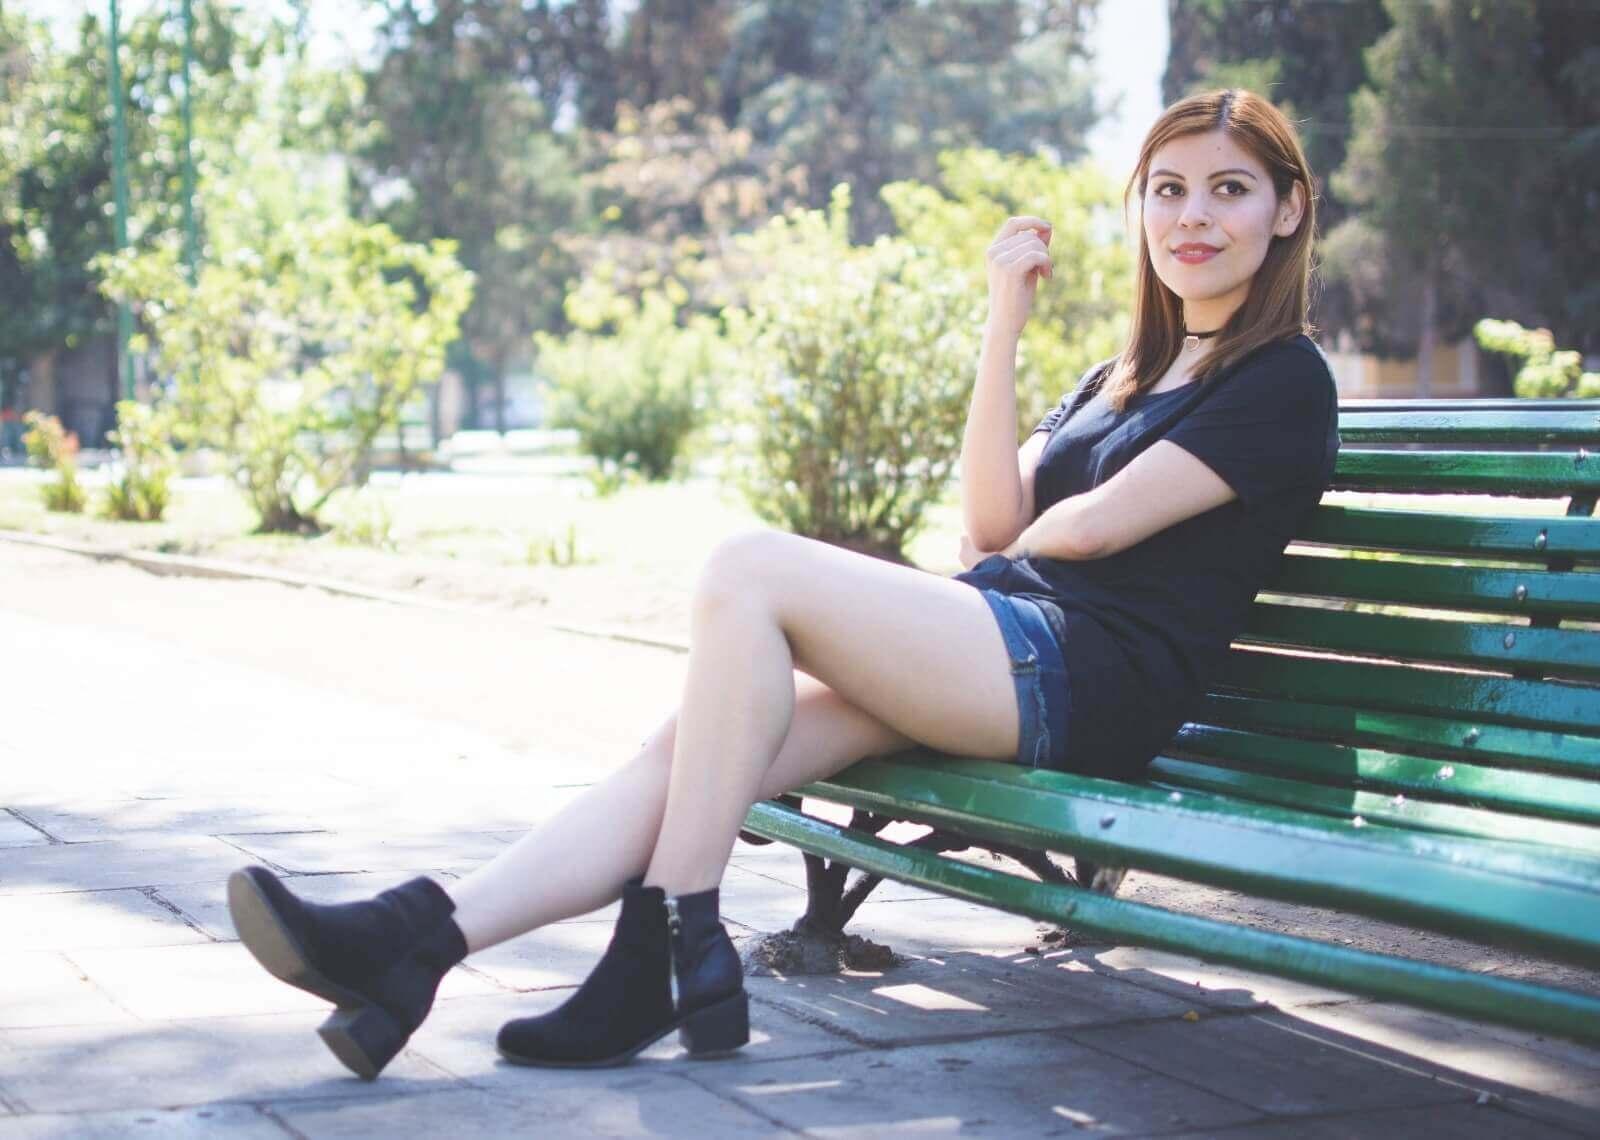 black-tshirt-jeans-california-girl-outfit-ankle-booties-summer-in-black-deborah-ferrero-style-by-deb11